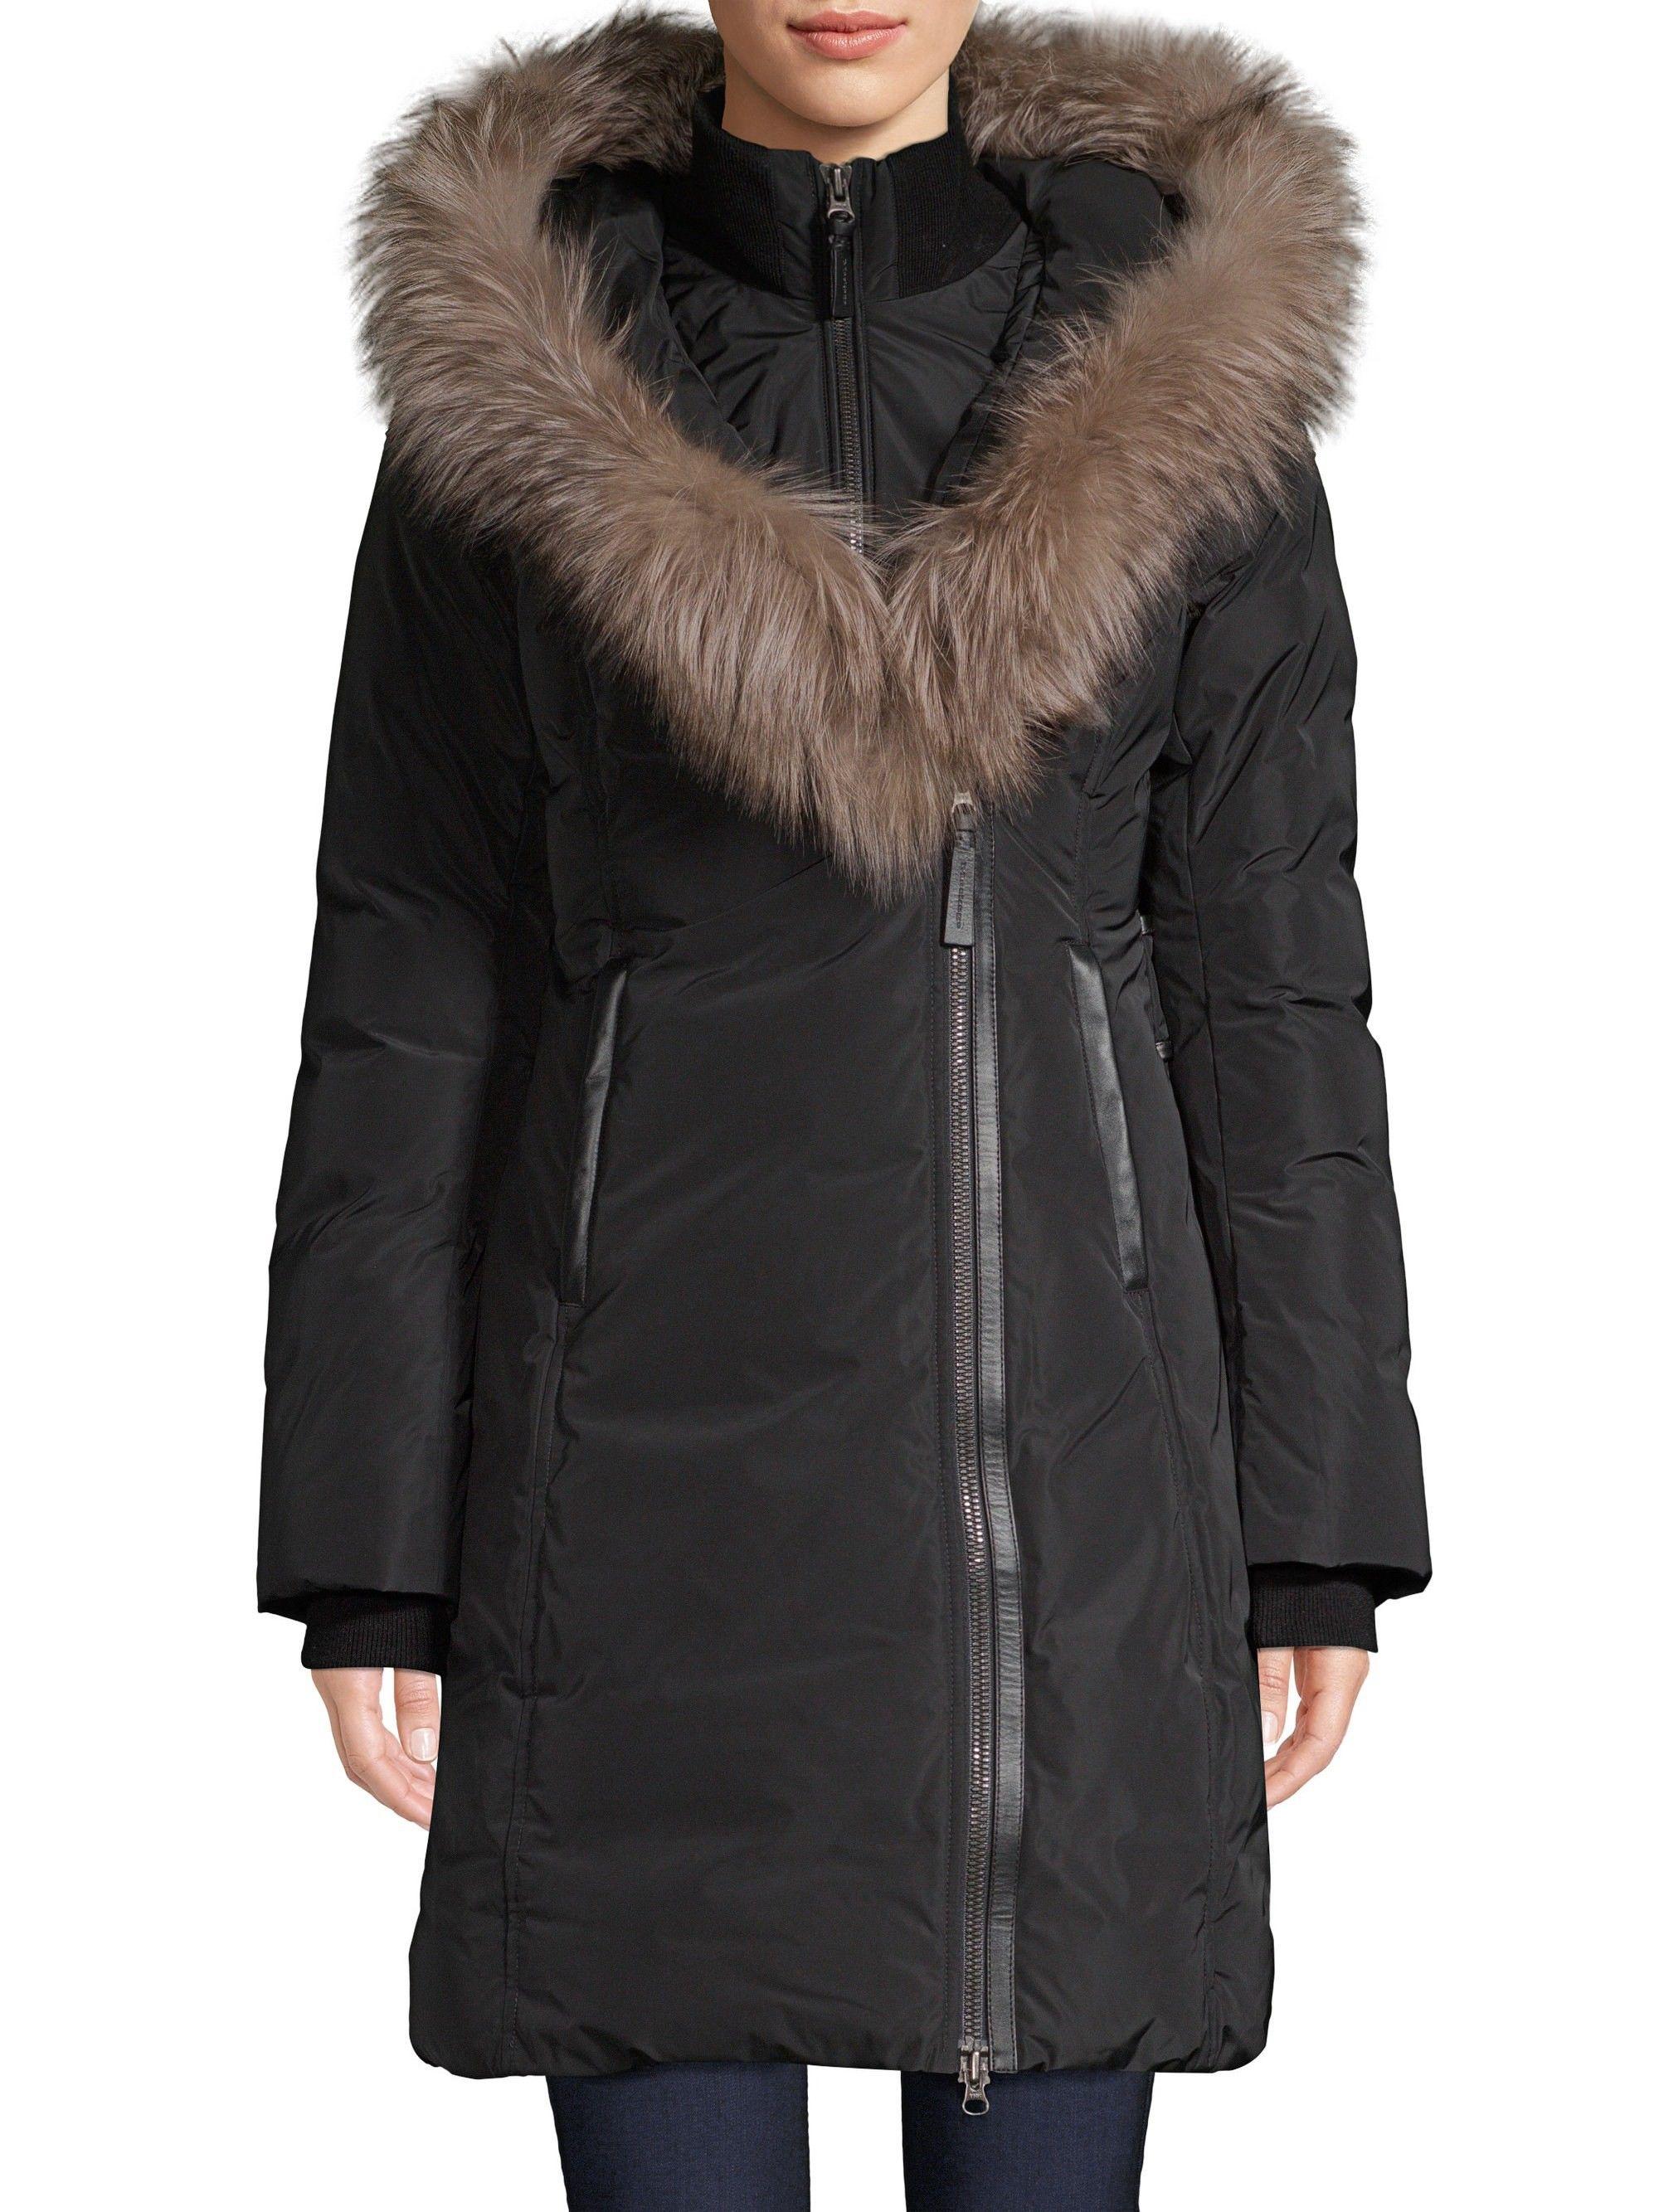 0ec3abc6cd5 Mackage Fox Fur Collar Down Coat - Black Medium